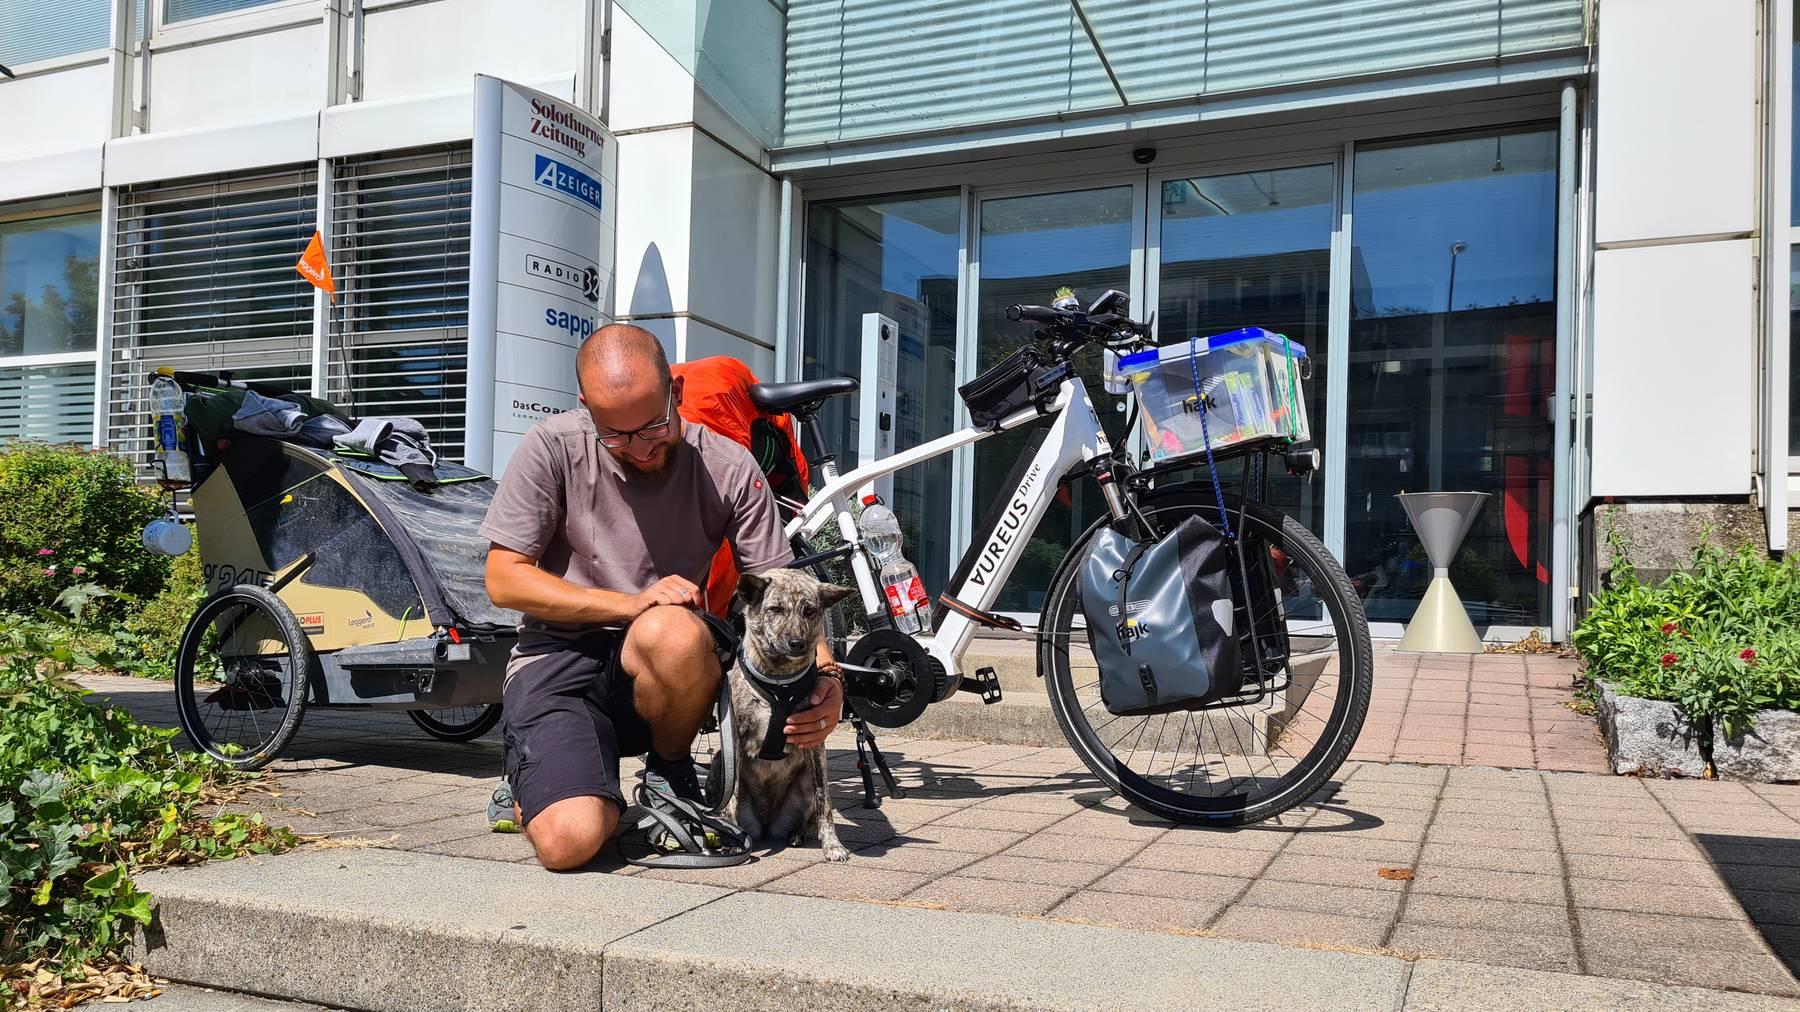 Reto Steimer mit Hündin Maja - 20 000 km für Strassenhunde